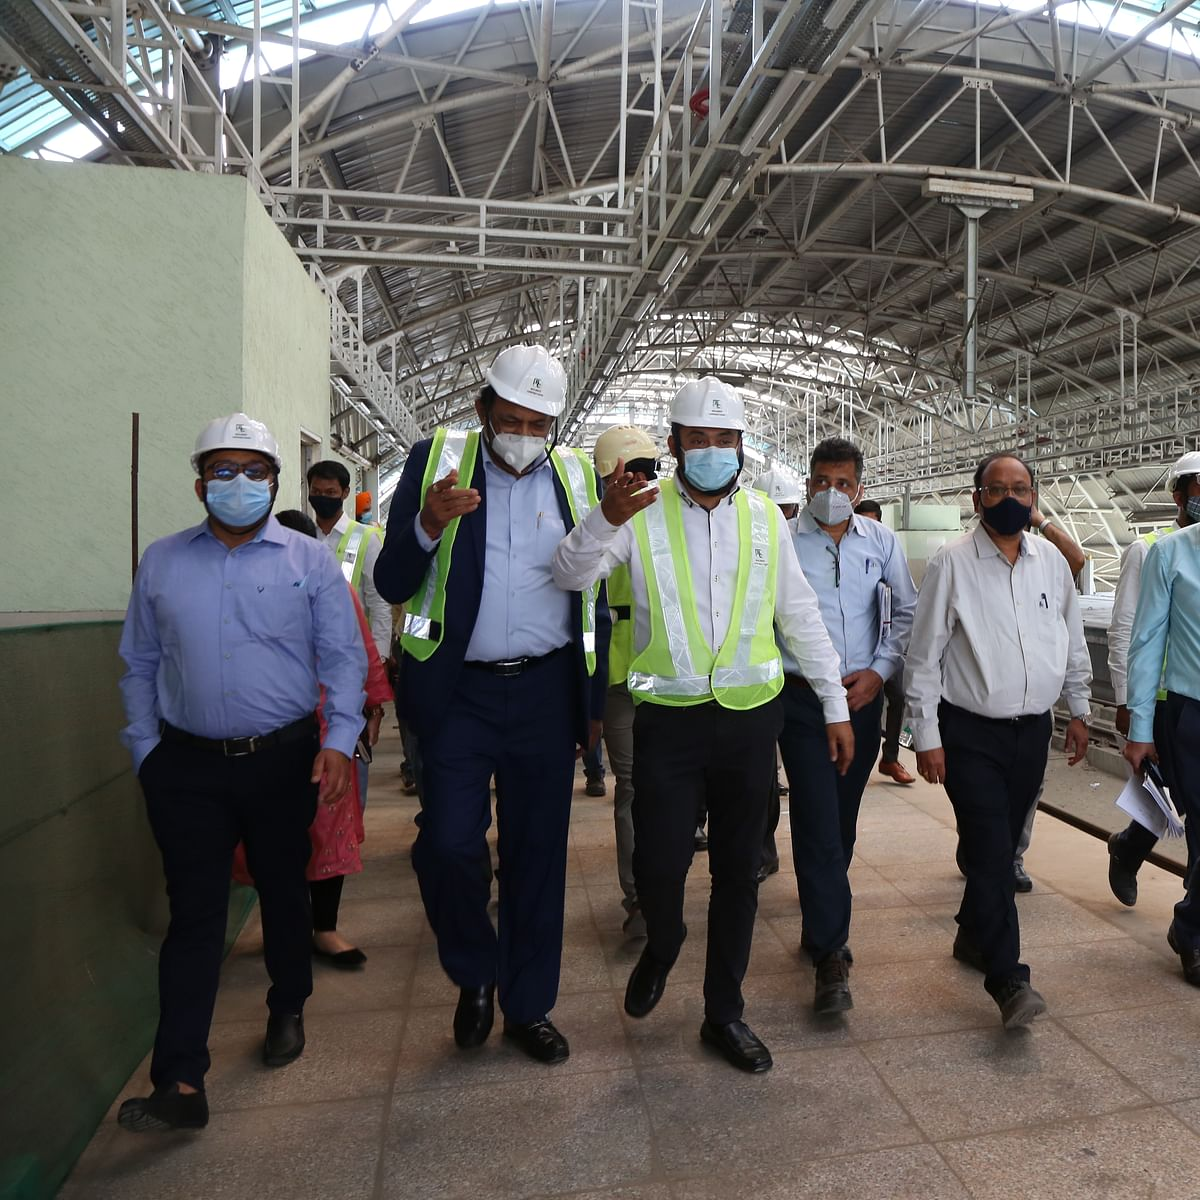 CIDCO expects partial operation of Navi Mumbai Metro by December 2021